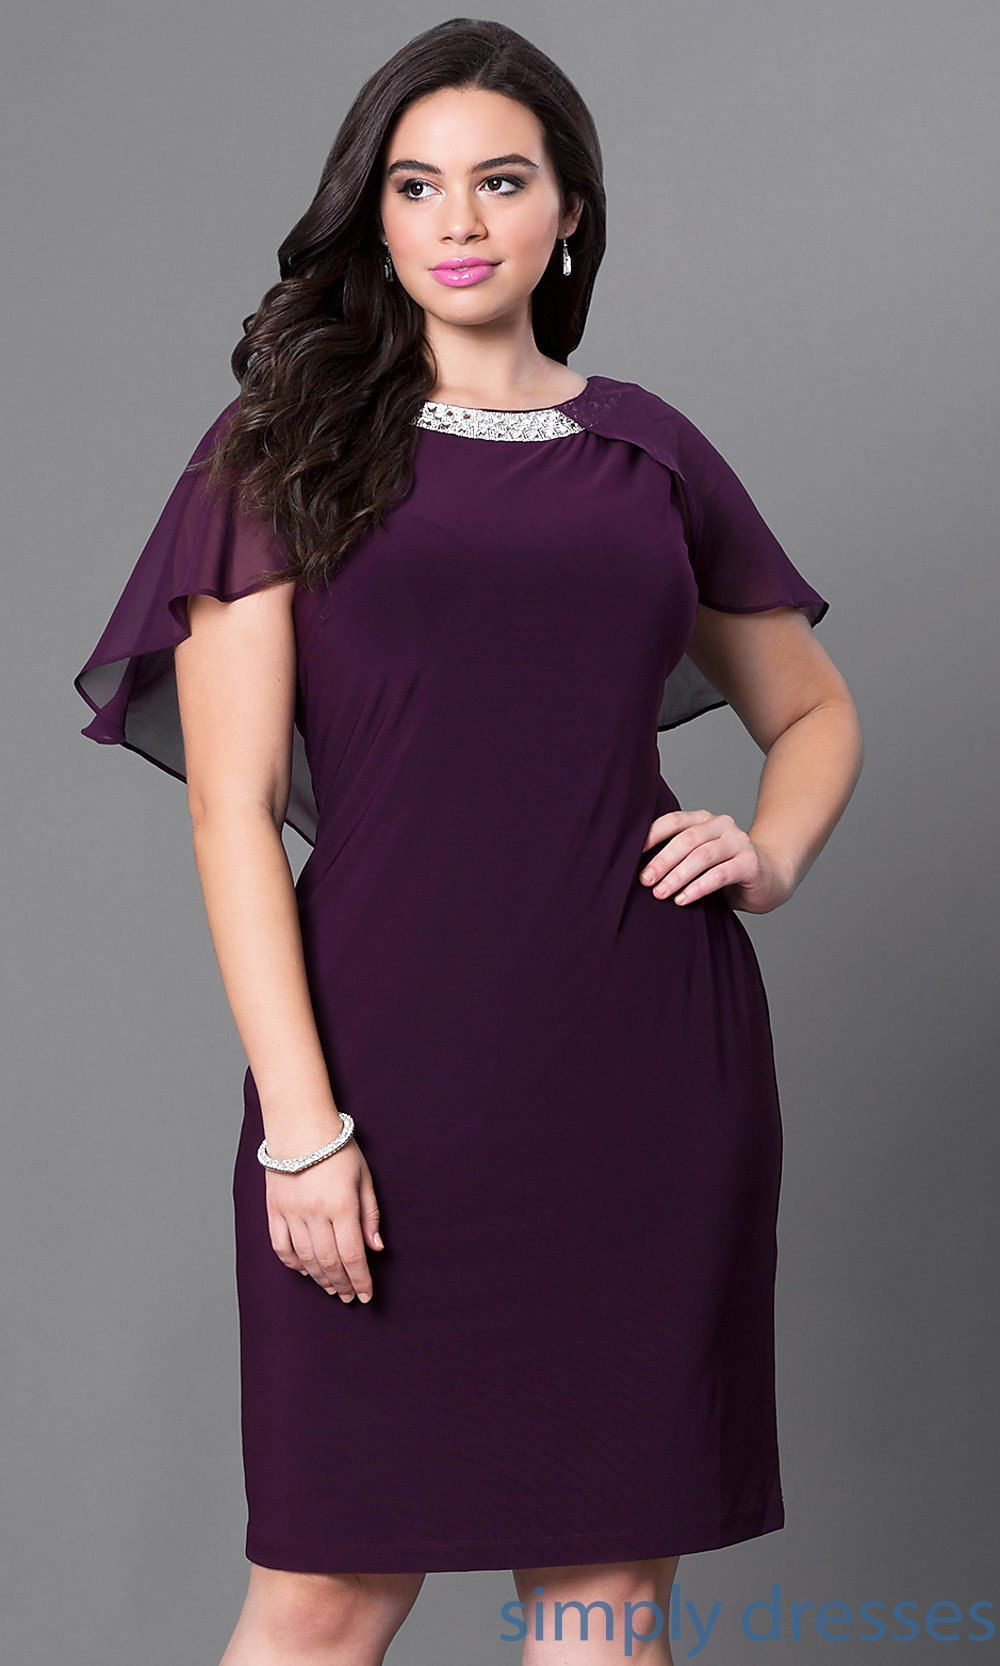 Semiformal cape dress with jeweled collar blusas pinterest